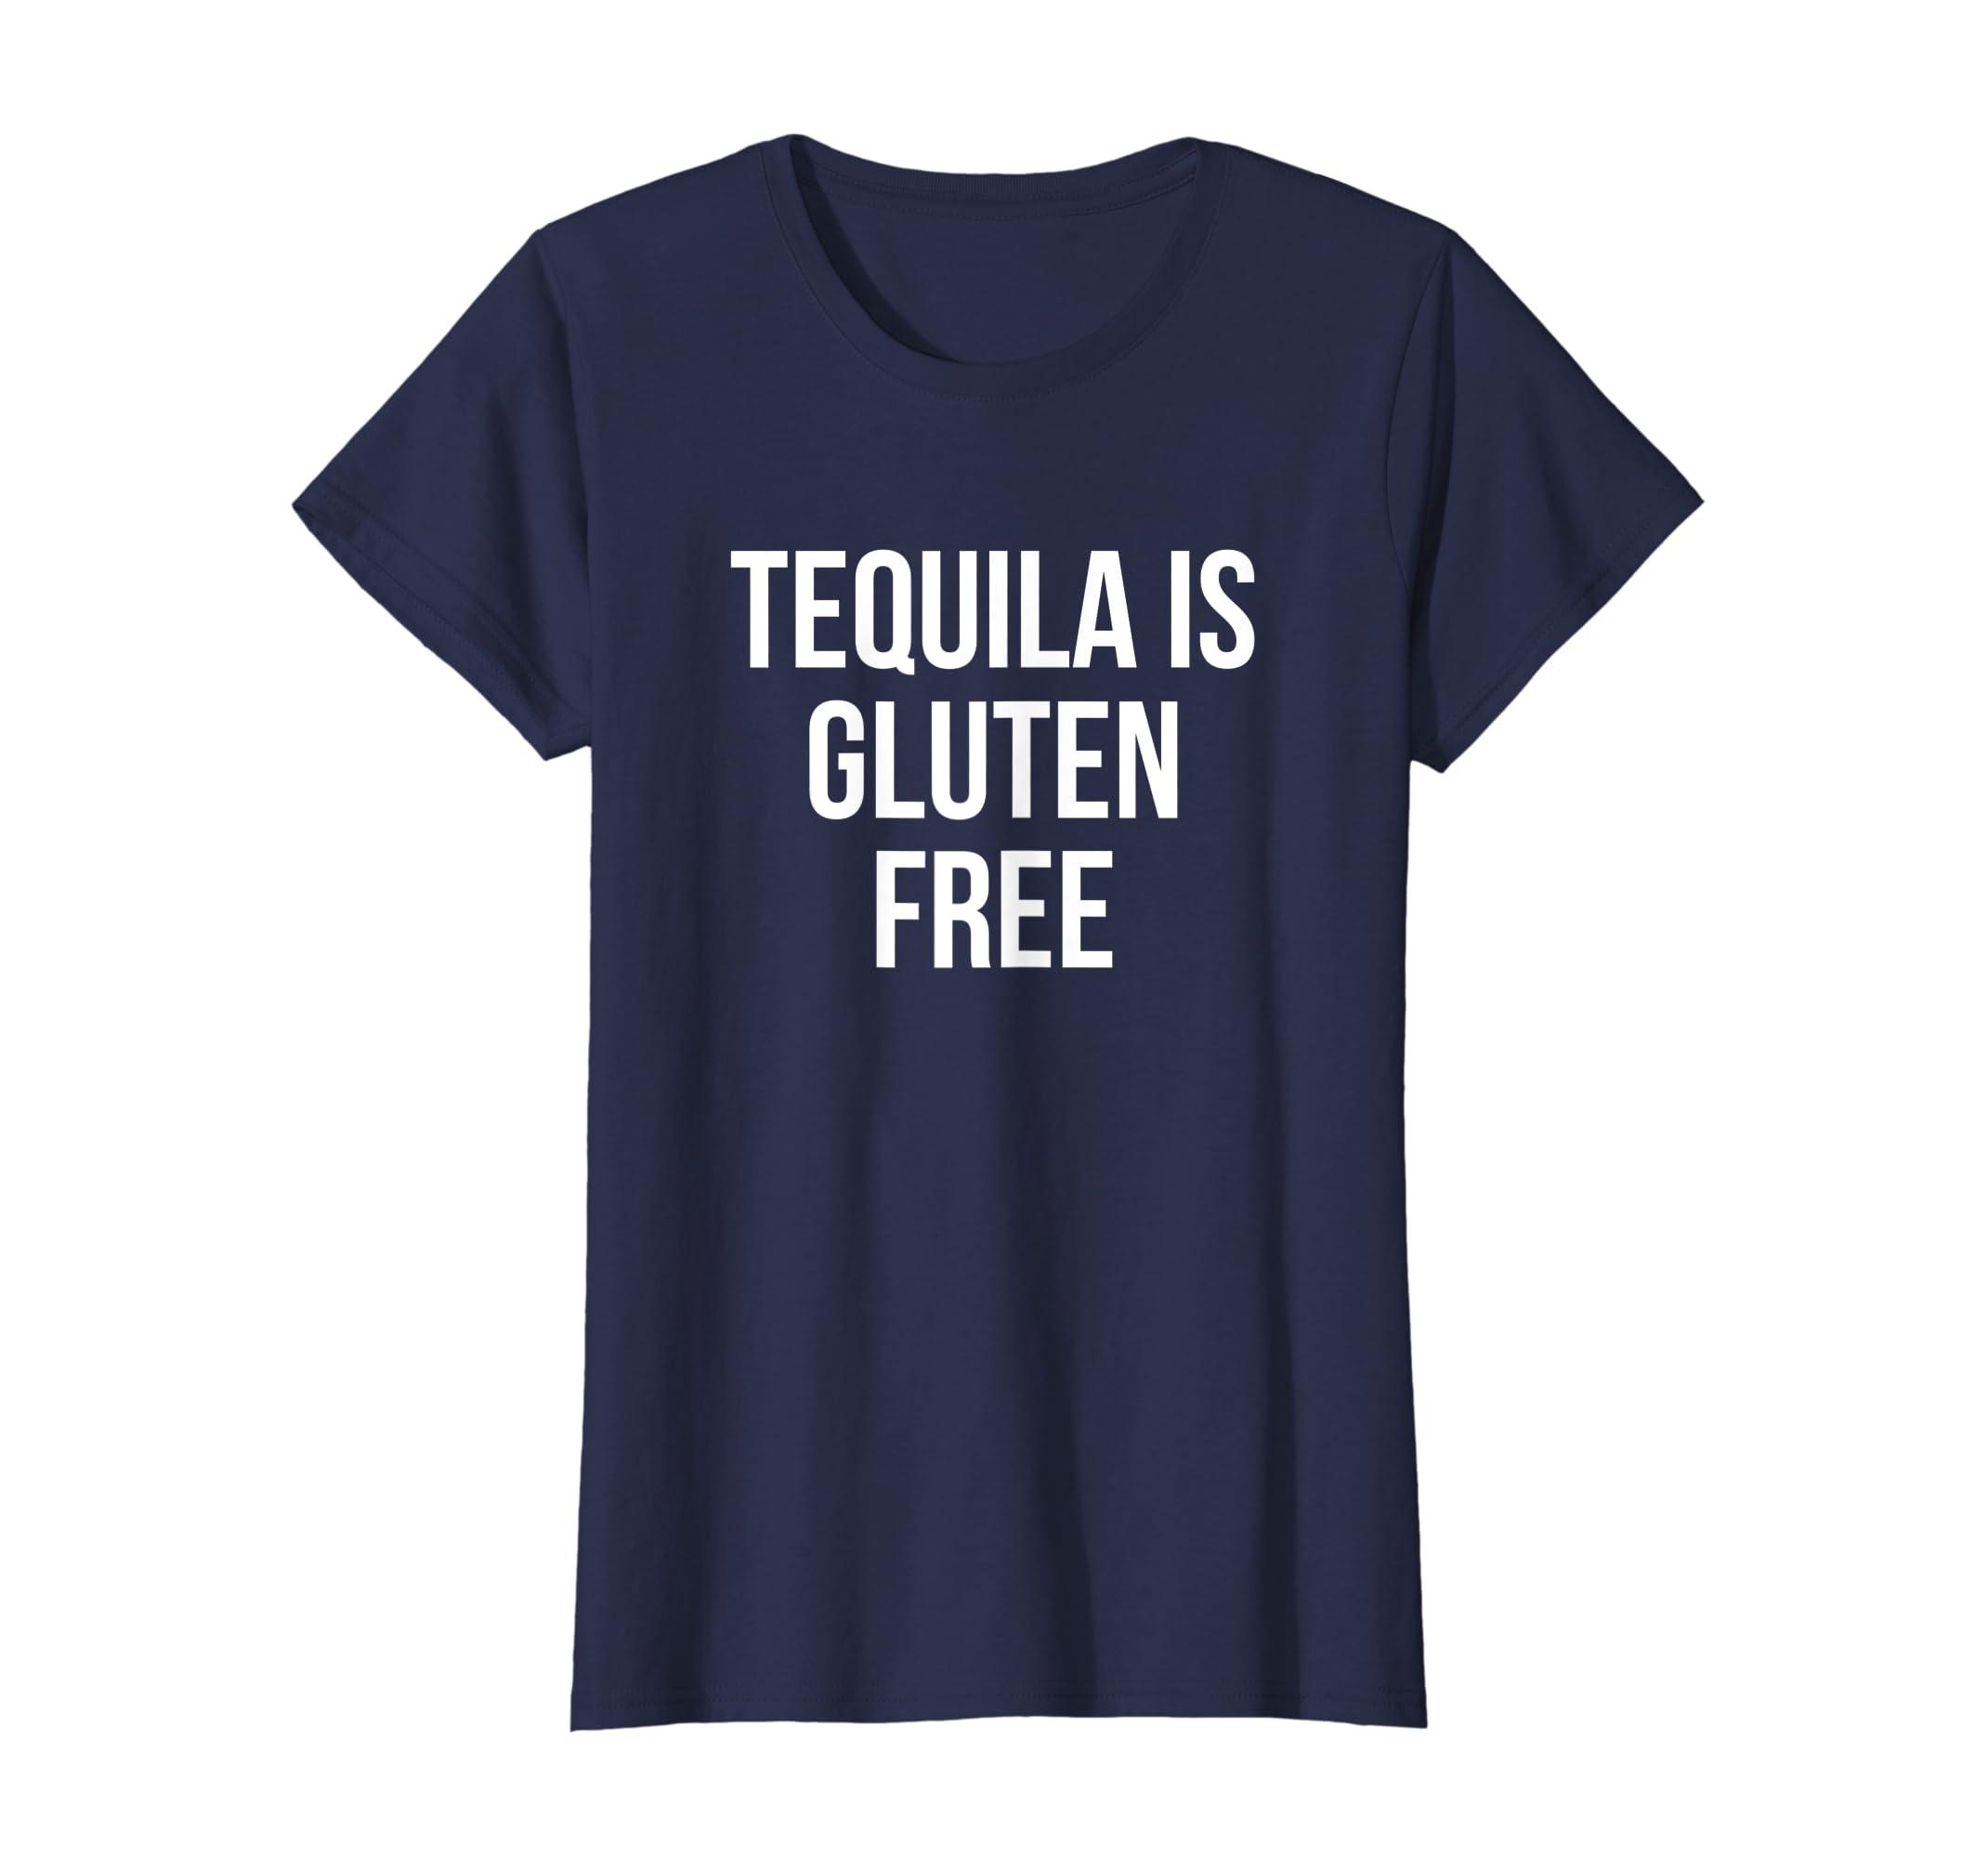 8d57adb62d Amazon.com: Tequila Is Gluten Free T-Shirt: Clothing